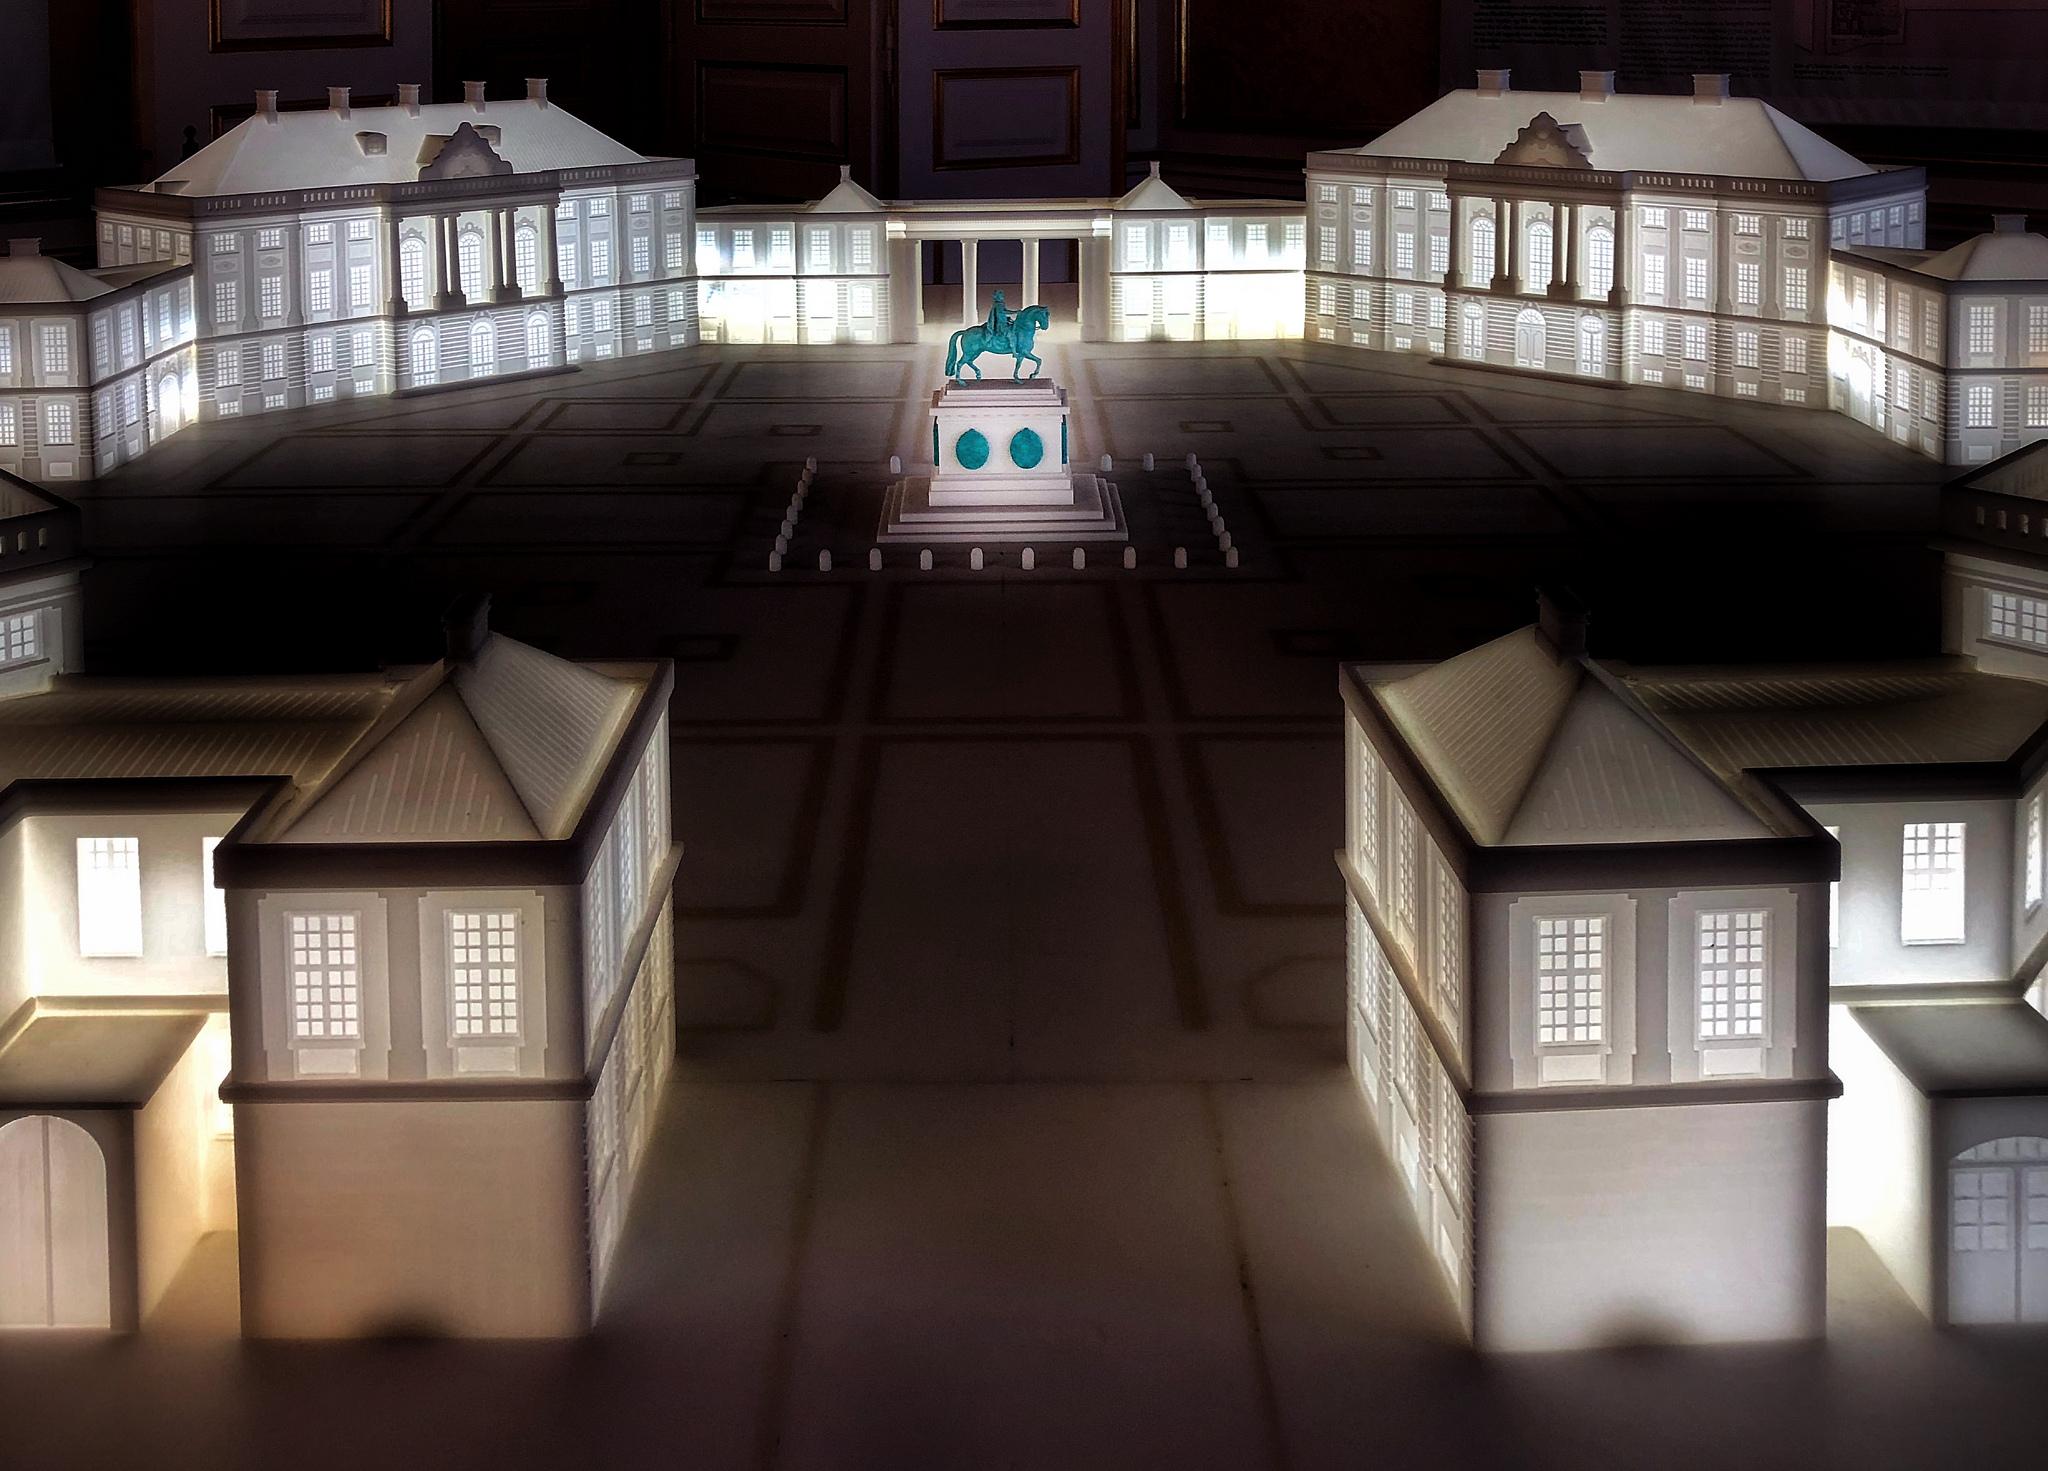 Amalienborg slotsplads model, Denmark